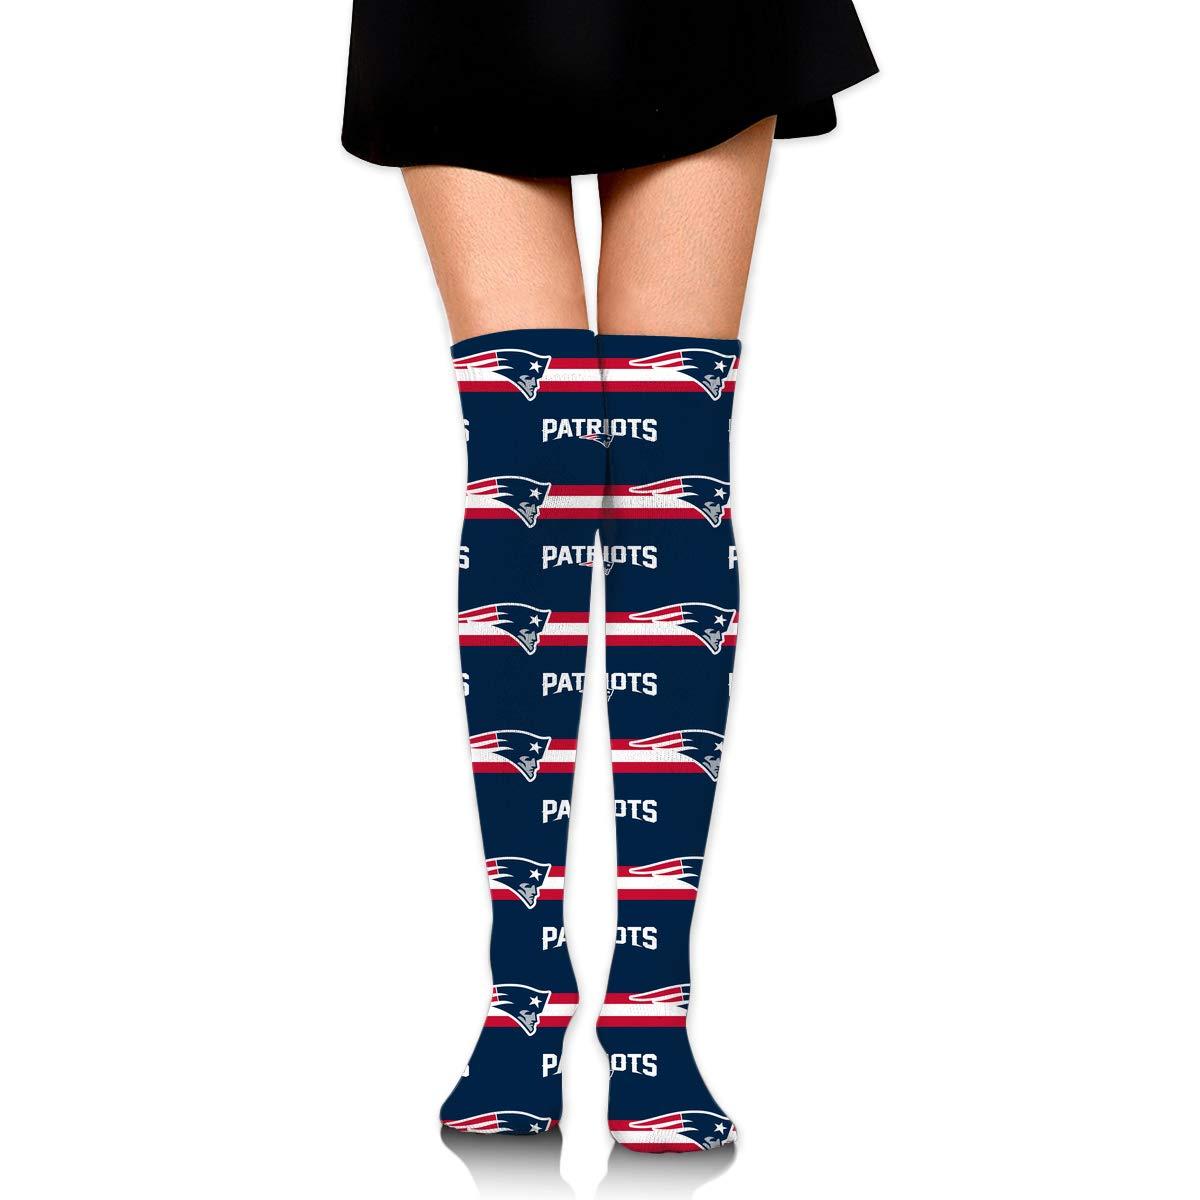 Sorcerer Custom Girls Over Knee High Boot Stockings Leg Warmers New England Patriots Women's Polyester Thigh High Socks Gift by Sorcerer